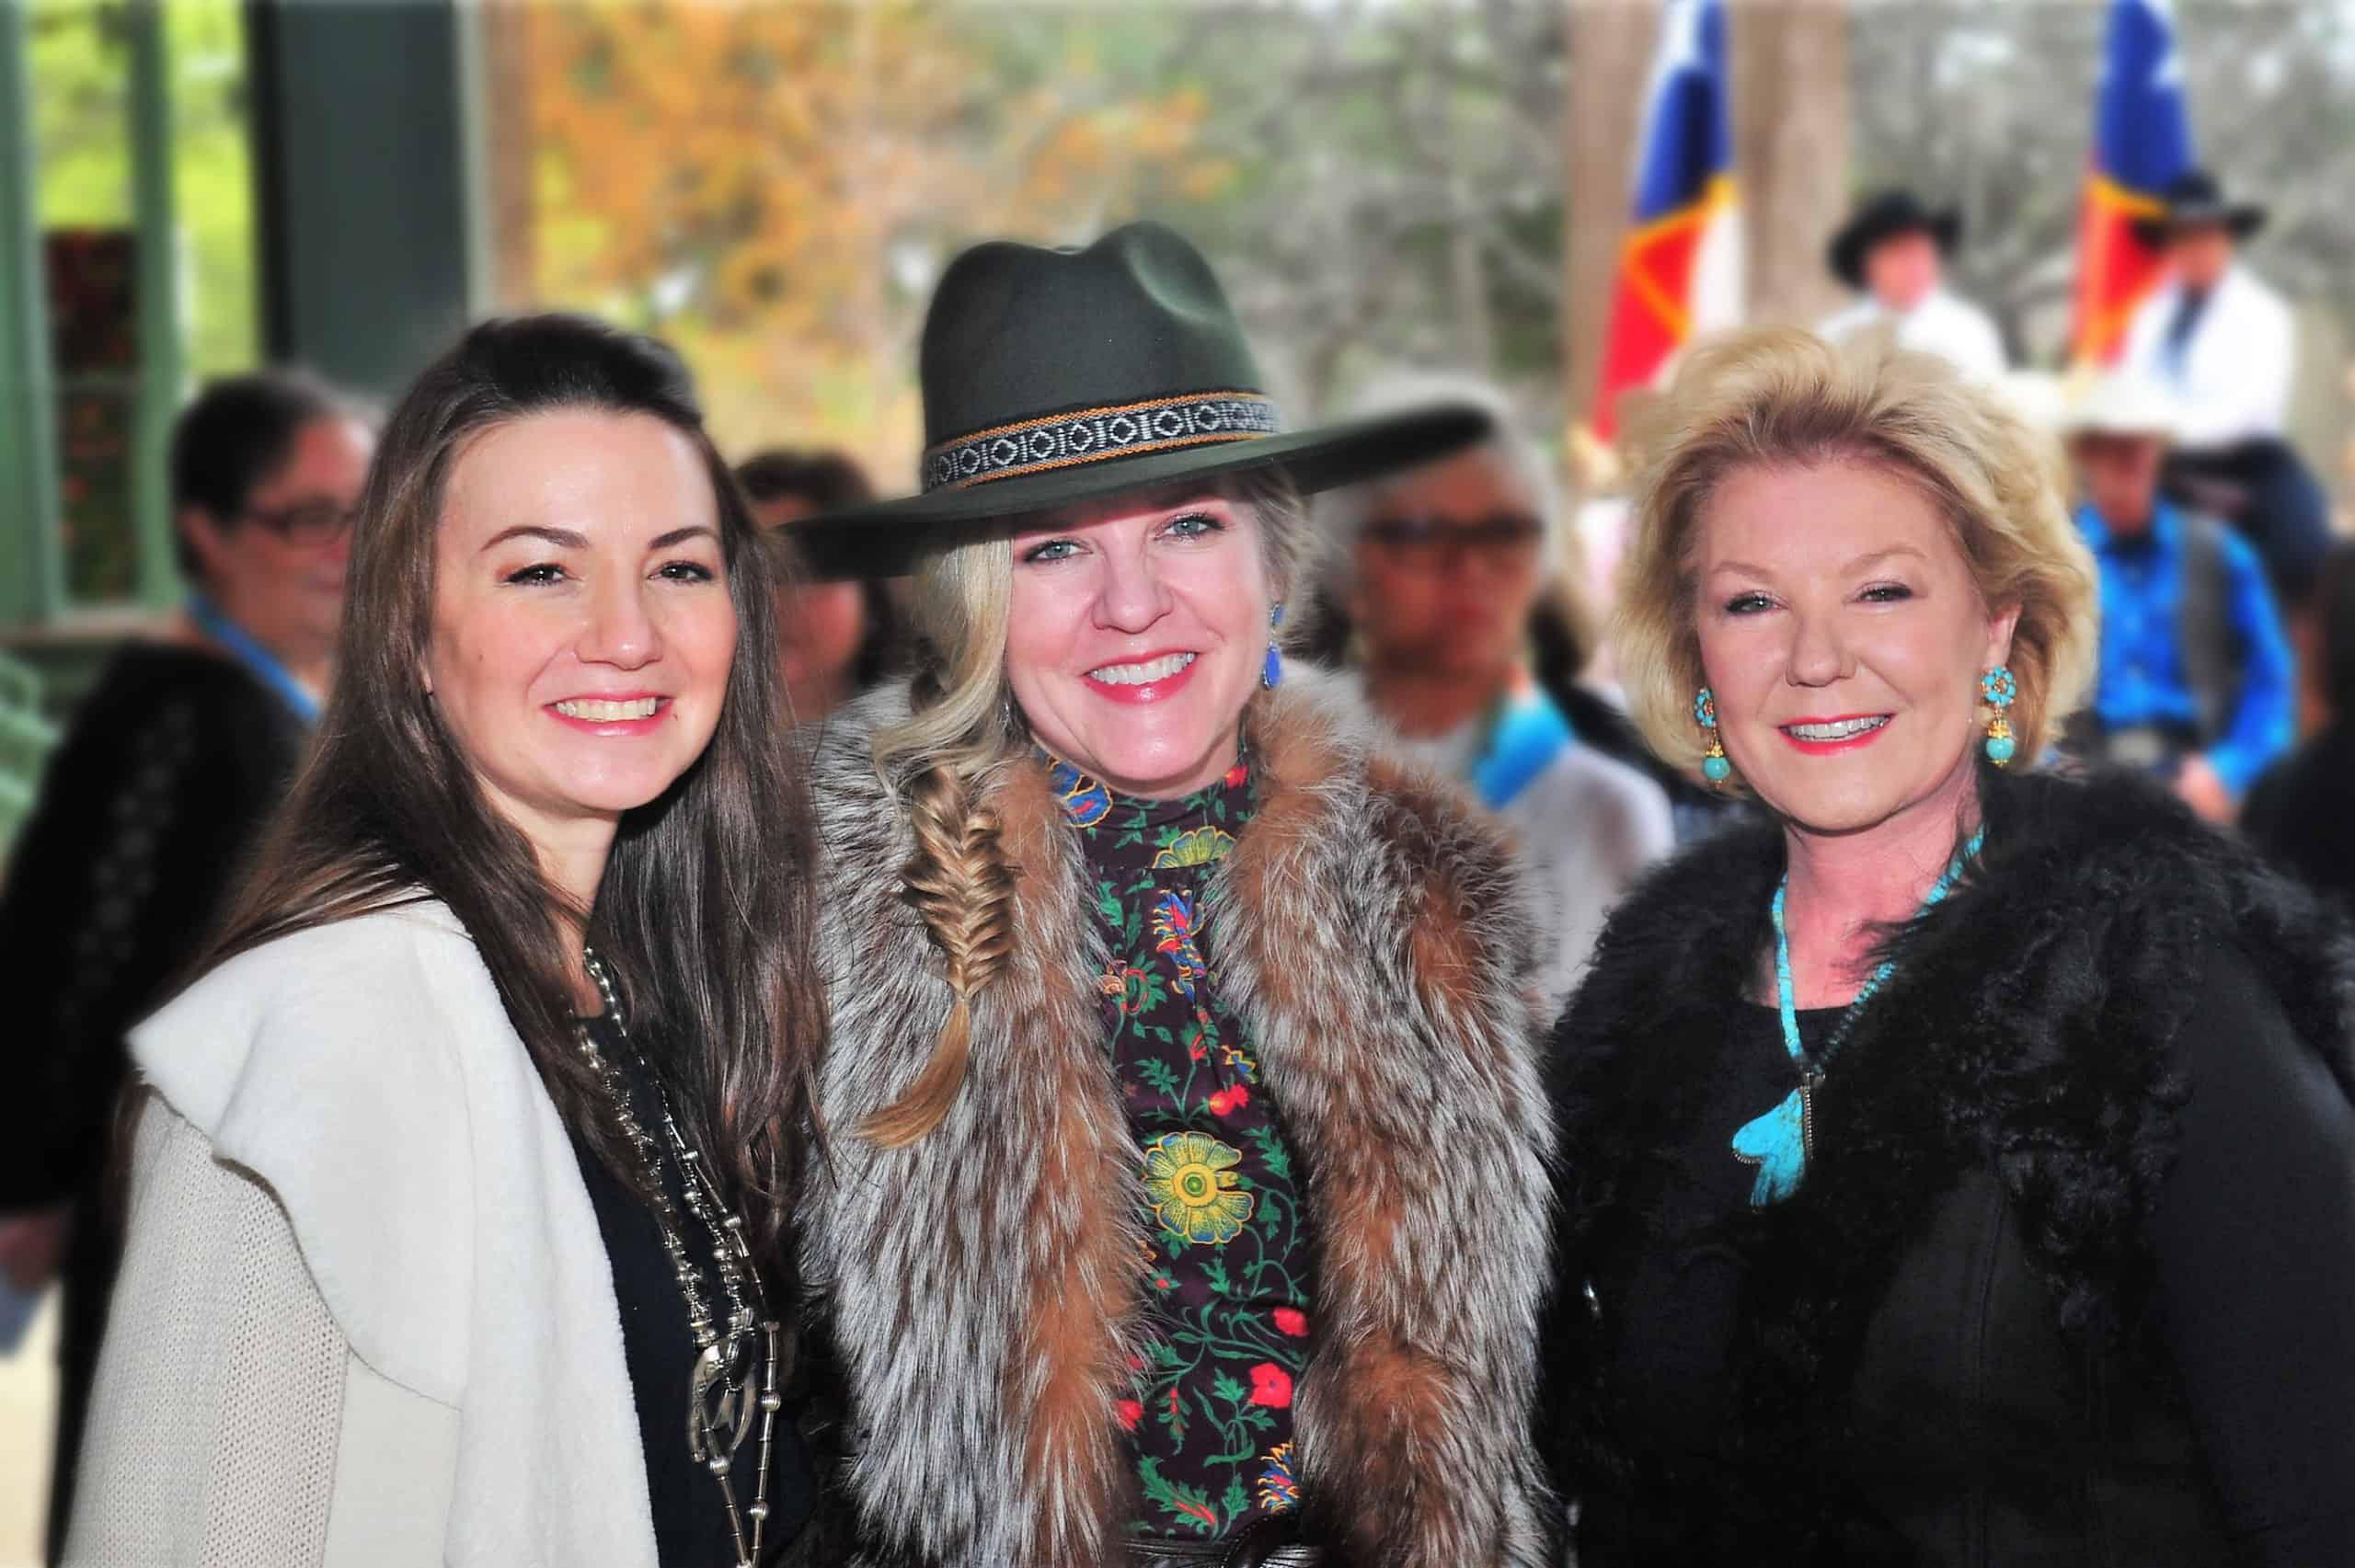 Karen Karawan, Heather Haynes and Bekki Kowalski